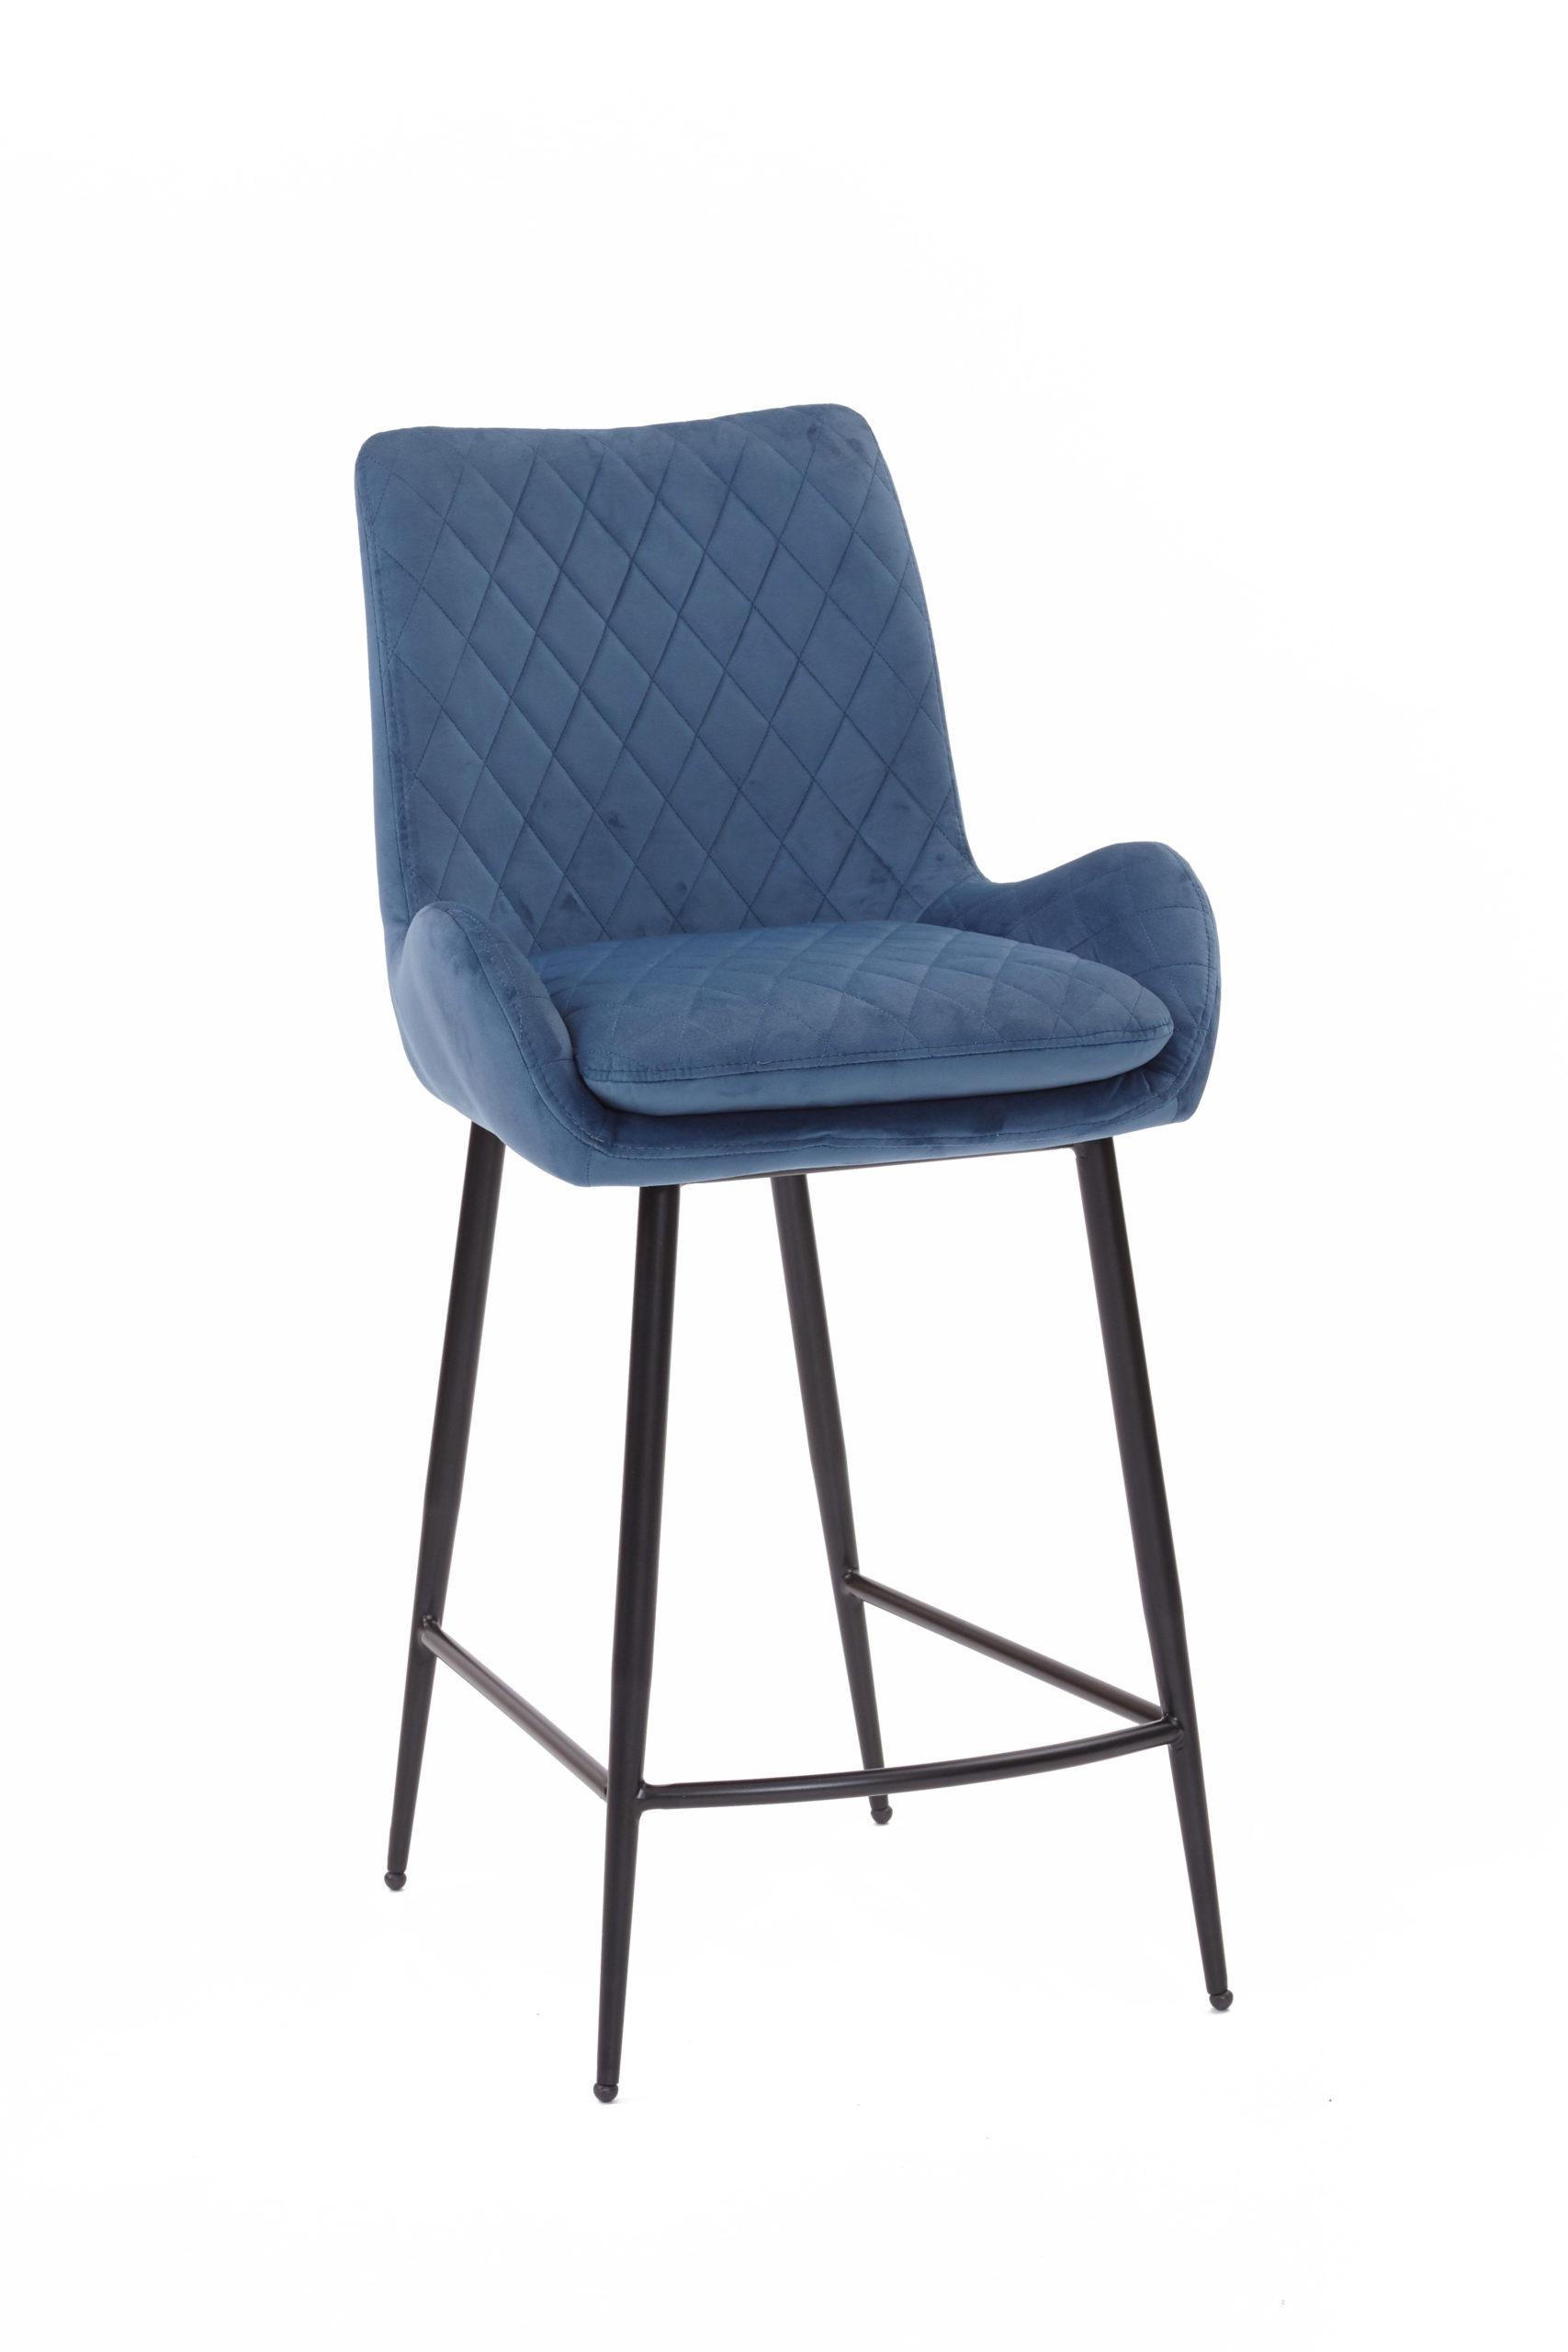 Caseys Furniture Picture: Miki Barlok